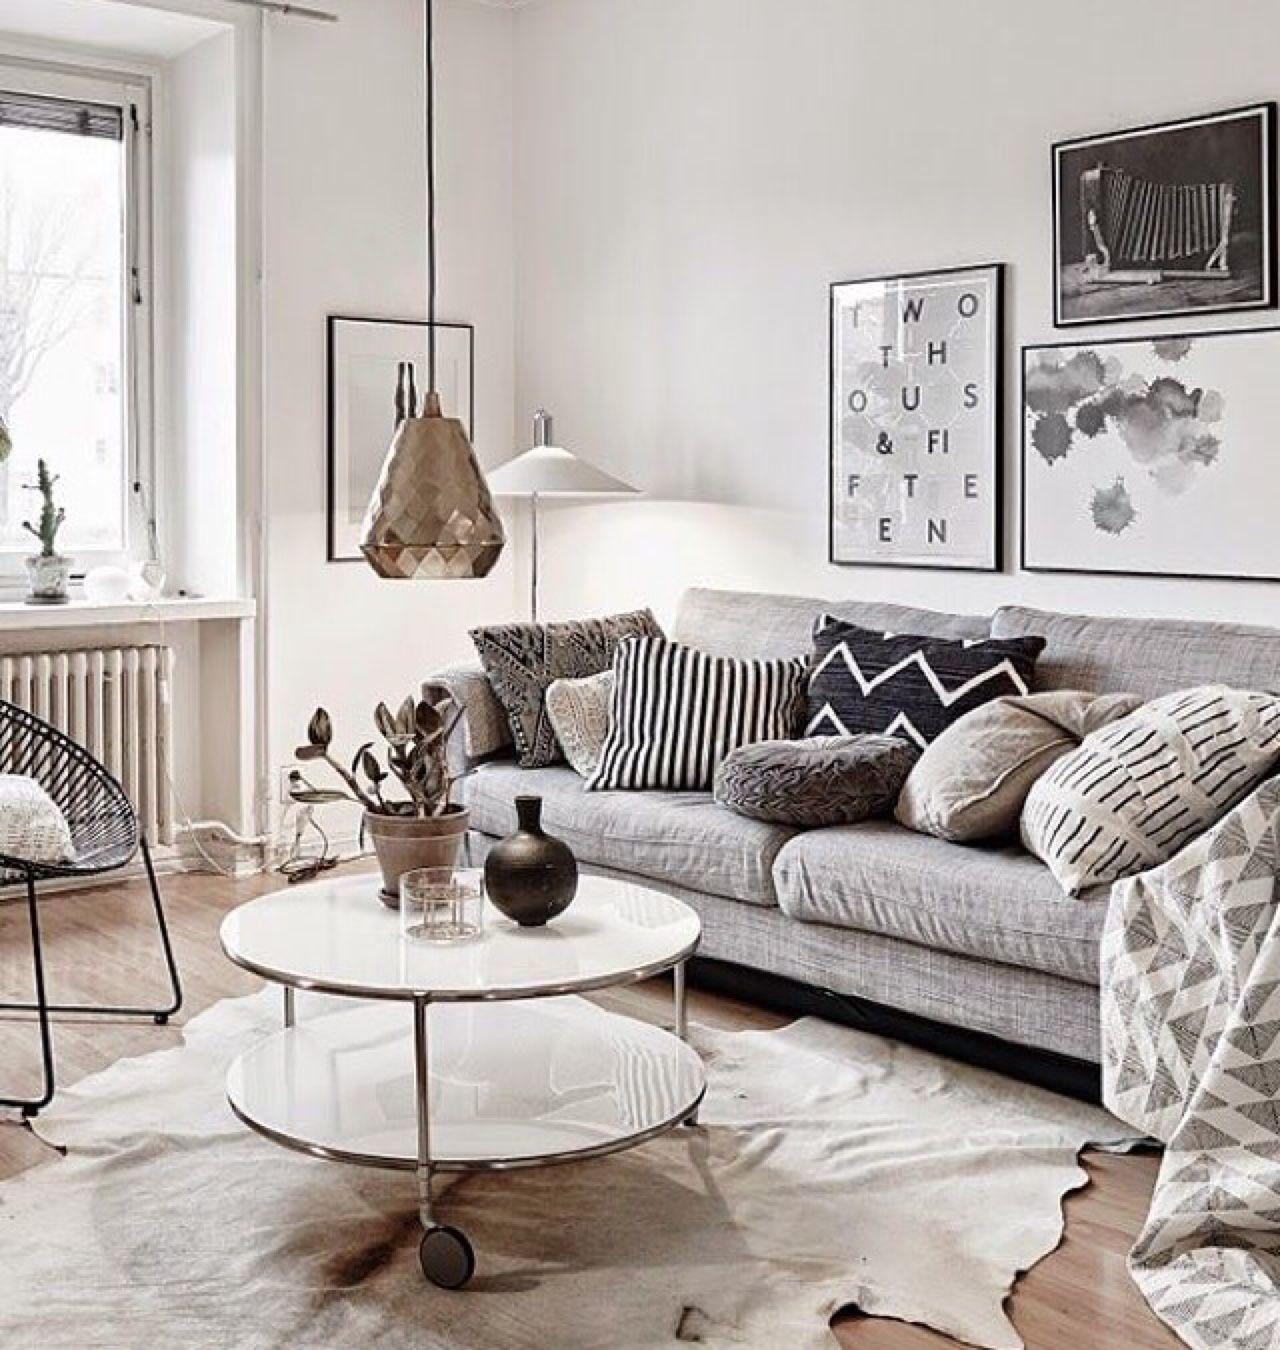 Scandinavian Design Via Pinterest Living Room Scandinavian Living Room Designs Room Interior